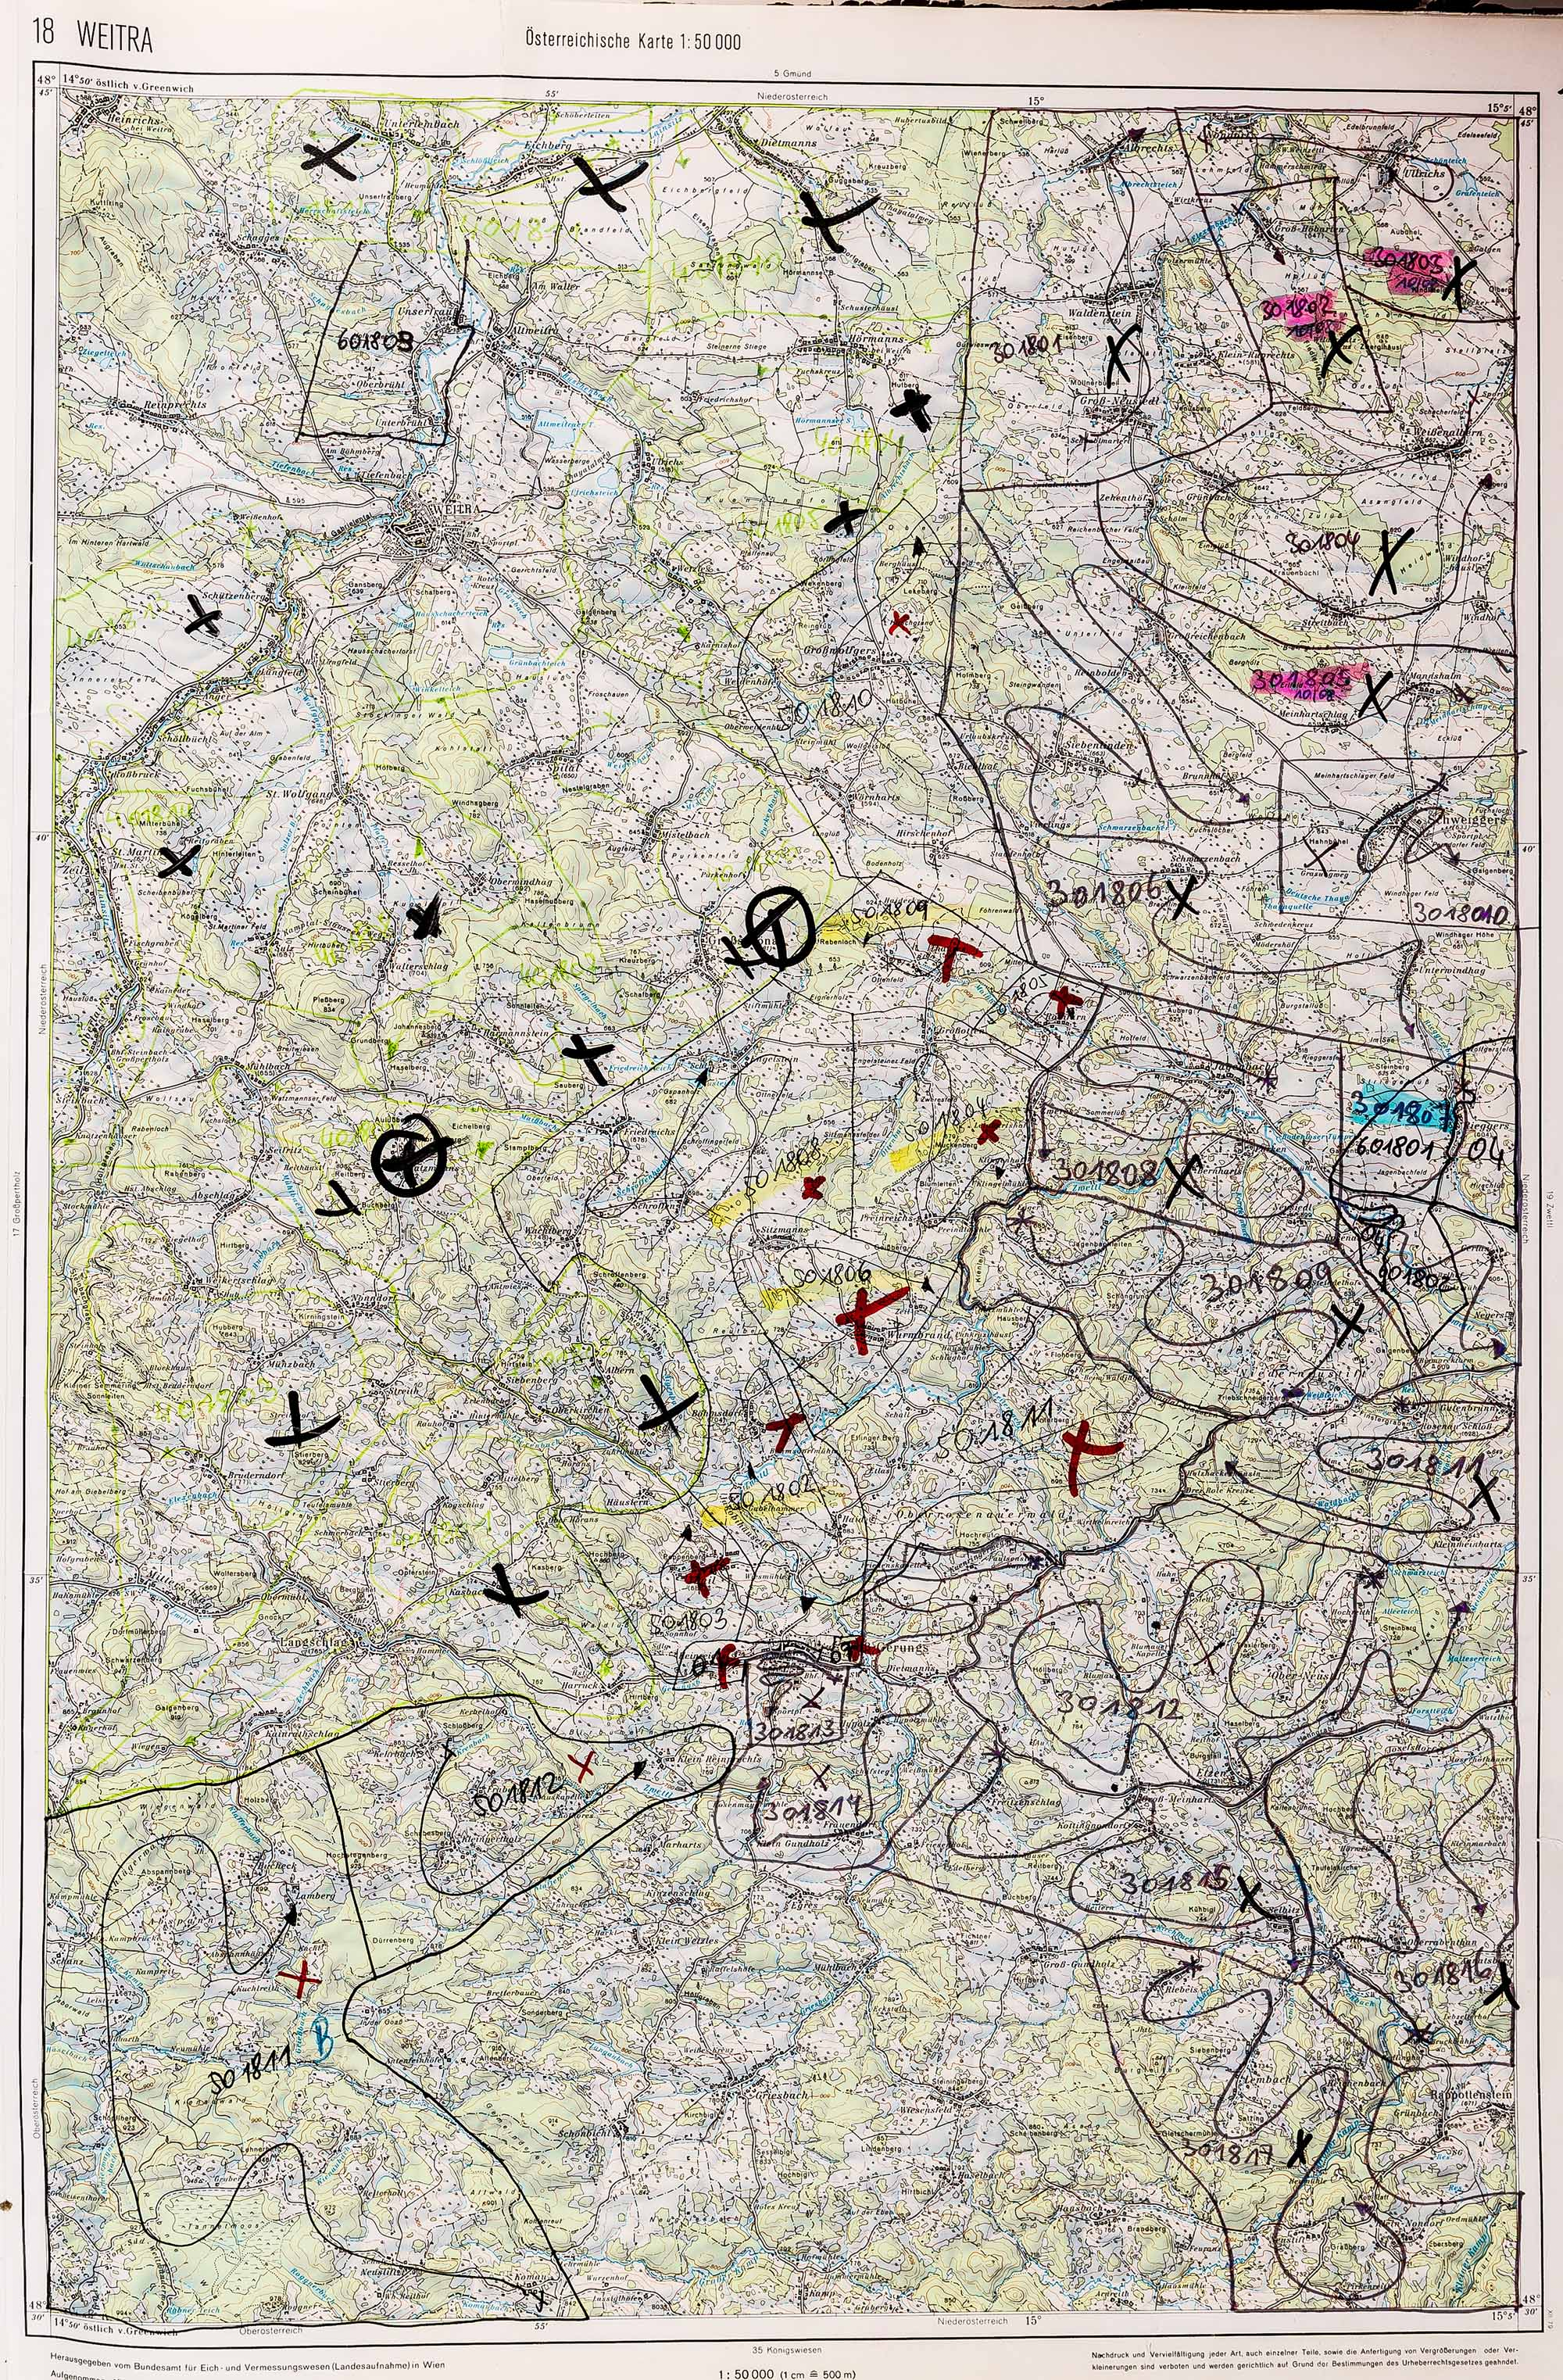 1983-1986 Karte 018